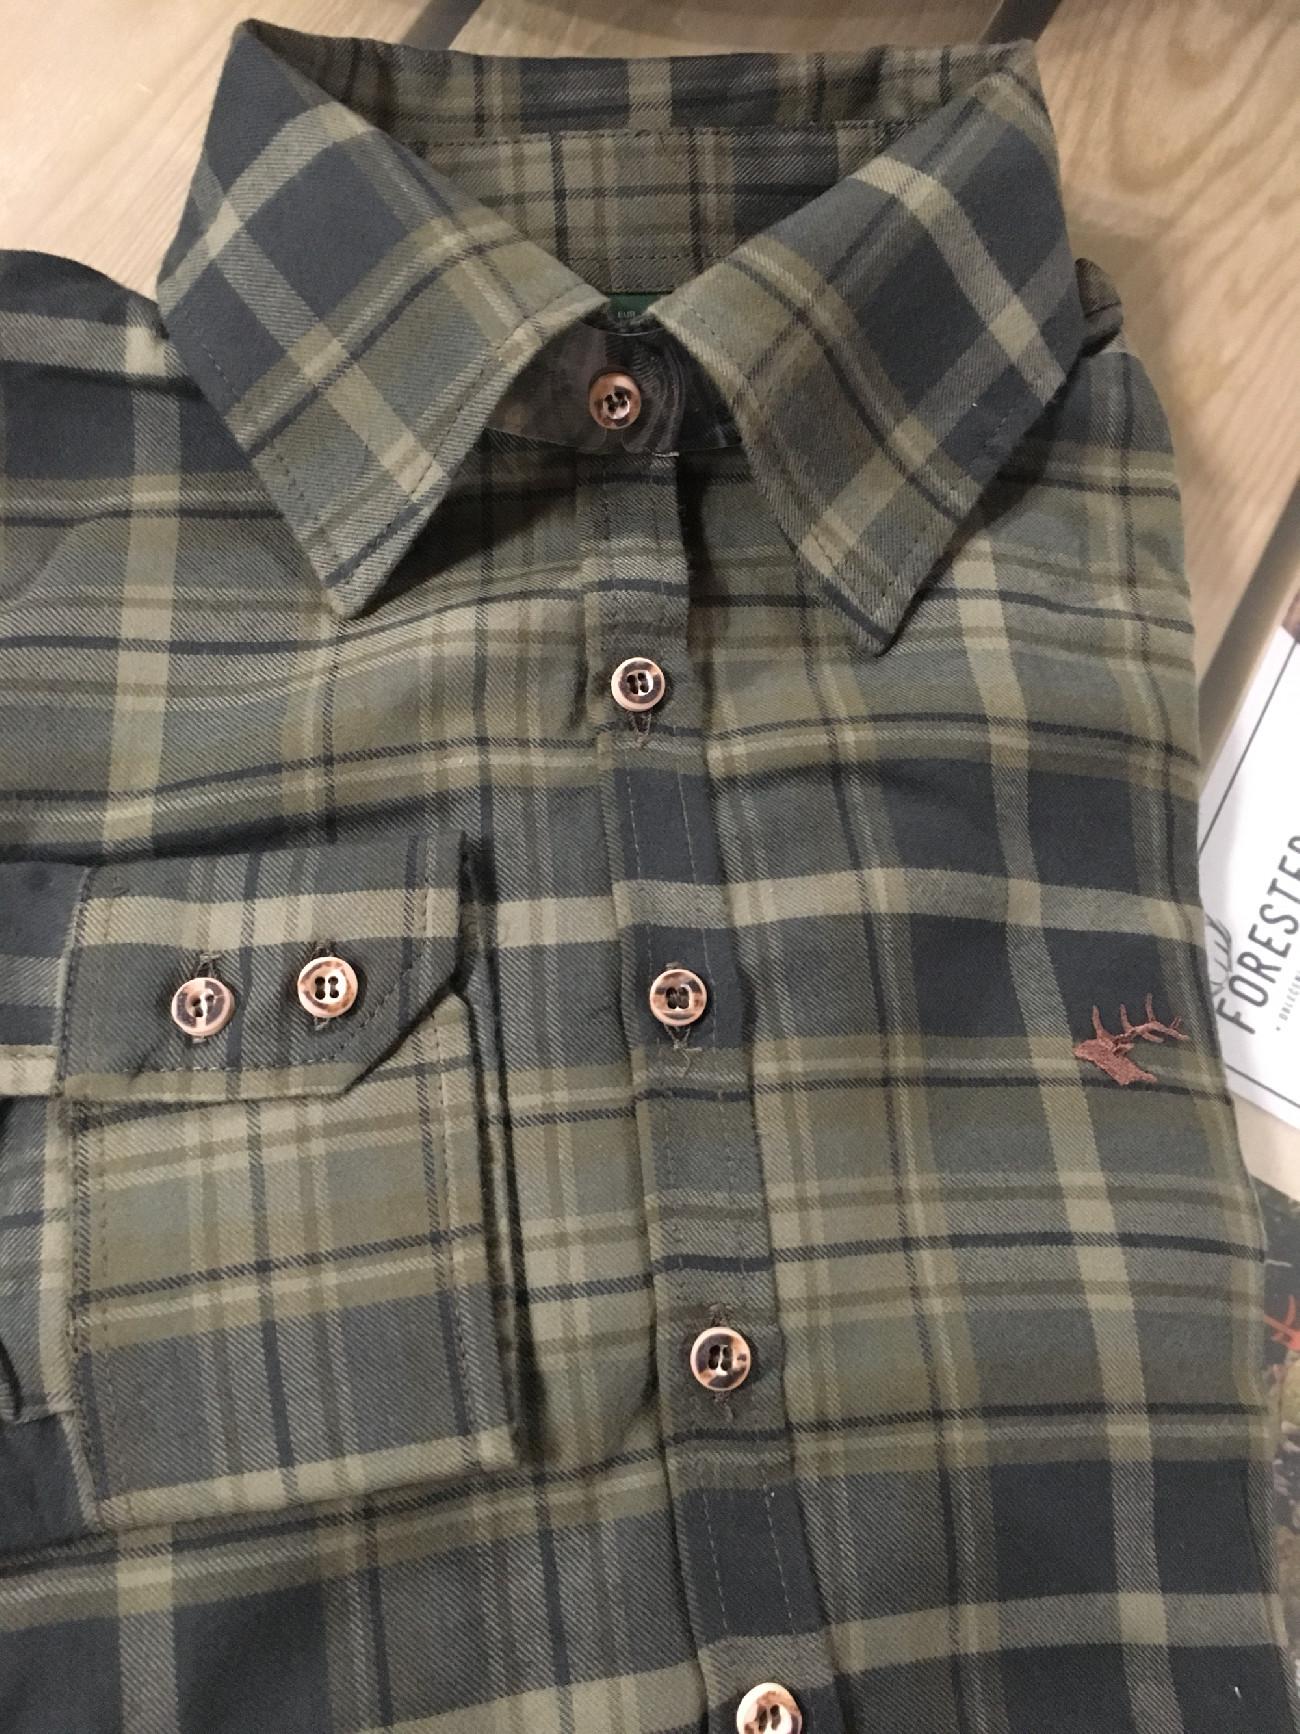 Orbis Dámská košile - flanel tm.zelená (57) Velikost  36 ea1e8562ab